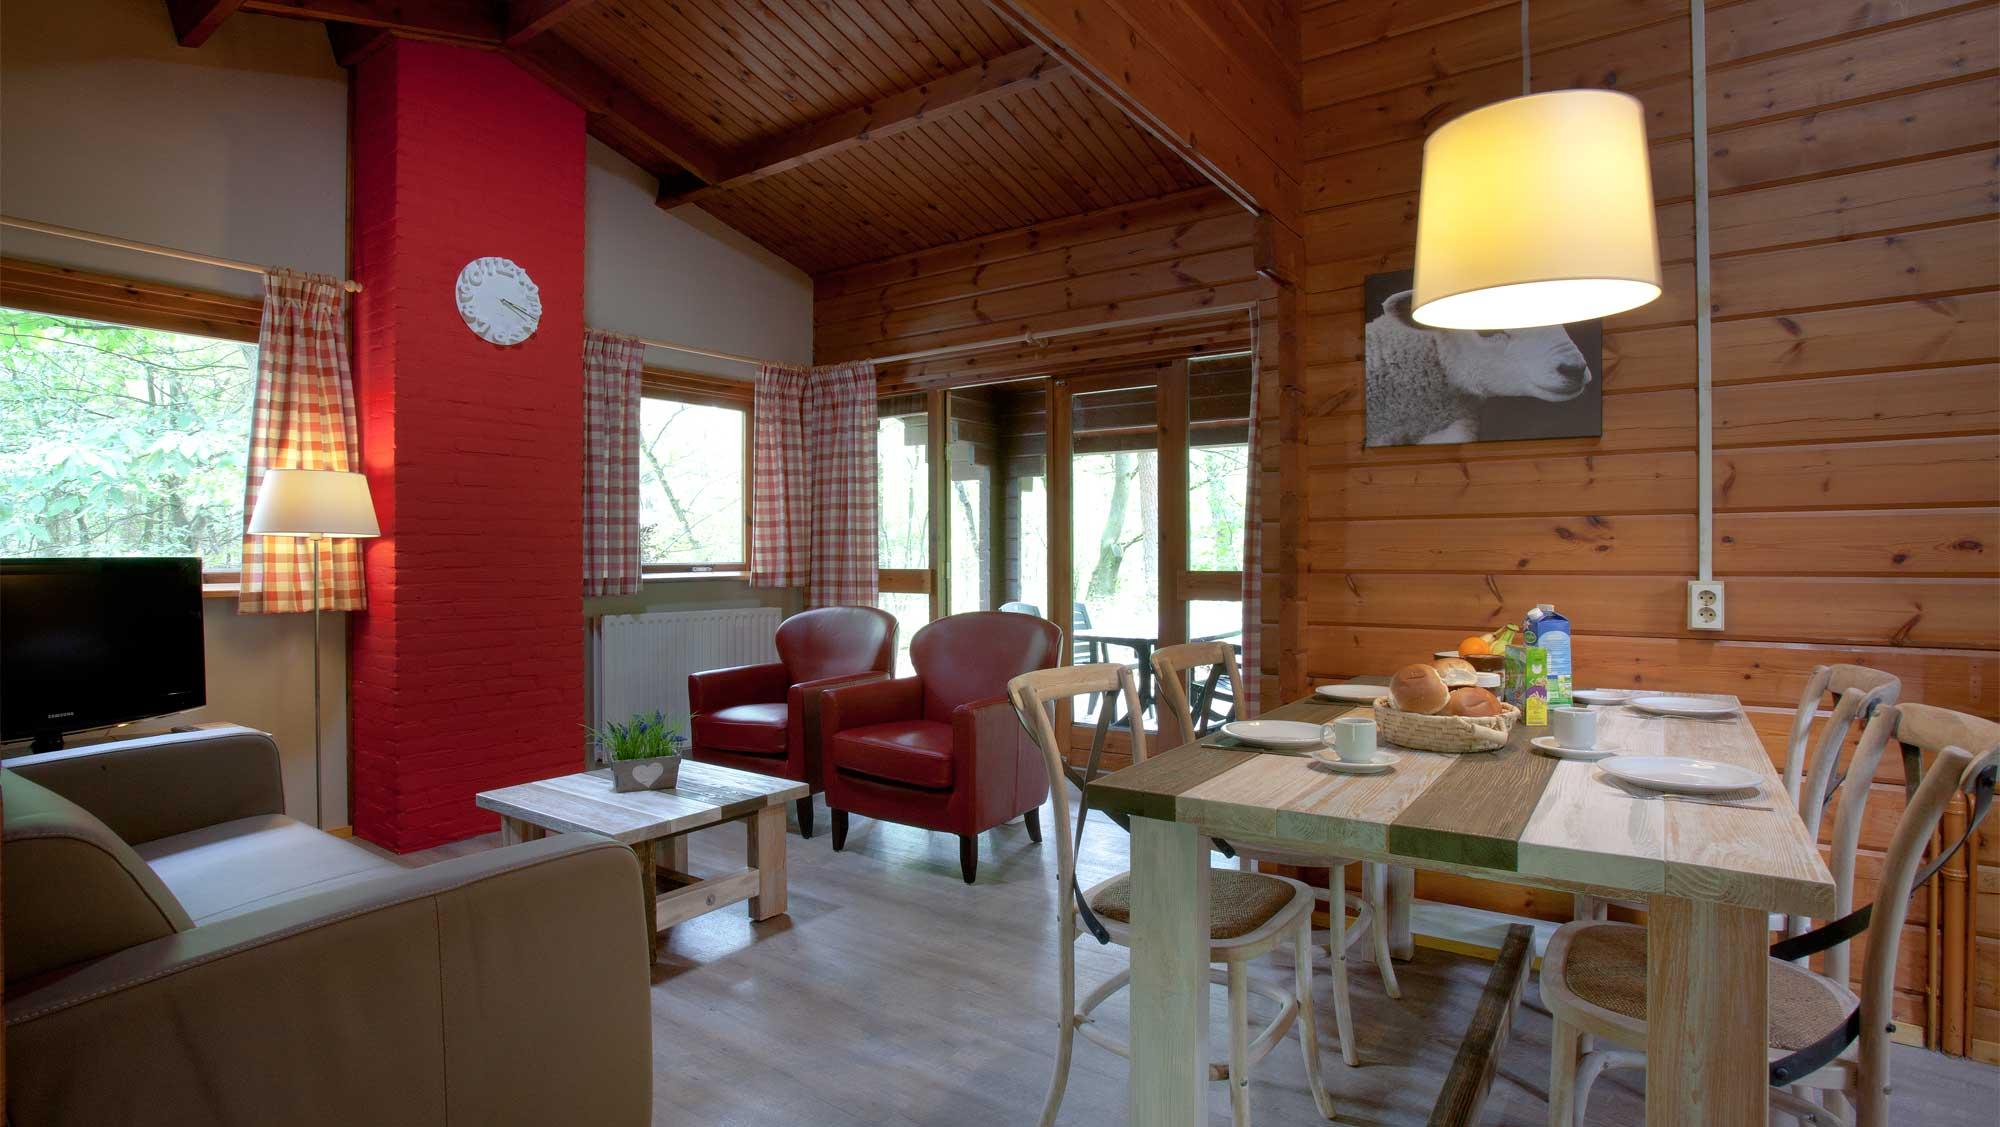 4pers bungalow Finse Molecaten Park Landgoed Ginkelduin interieur 03